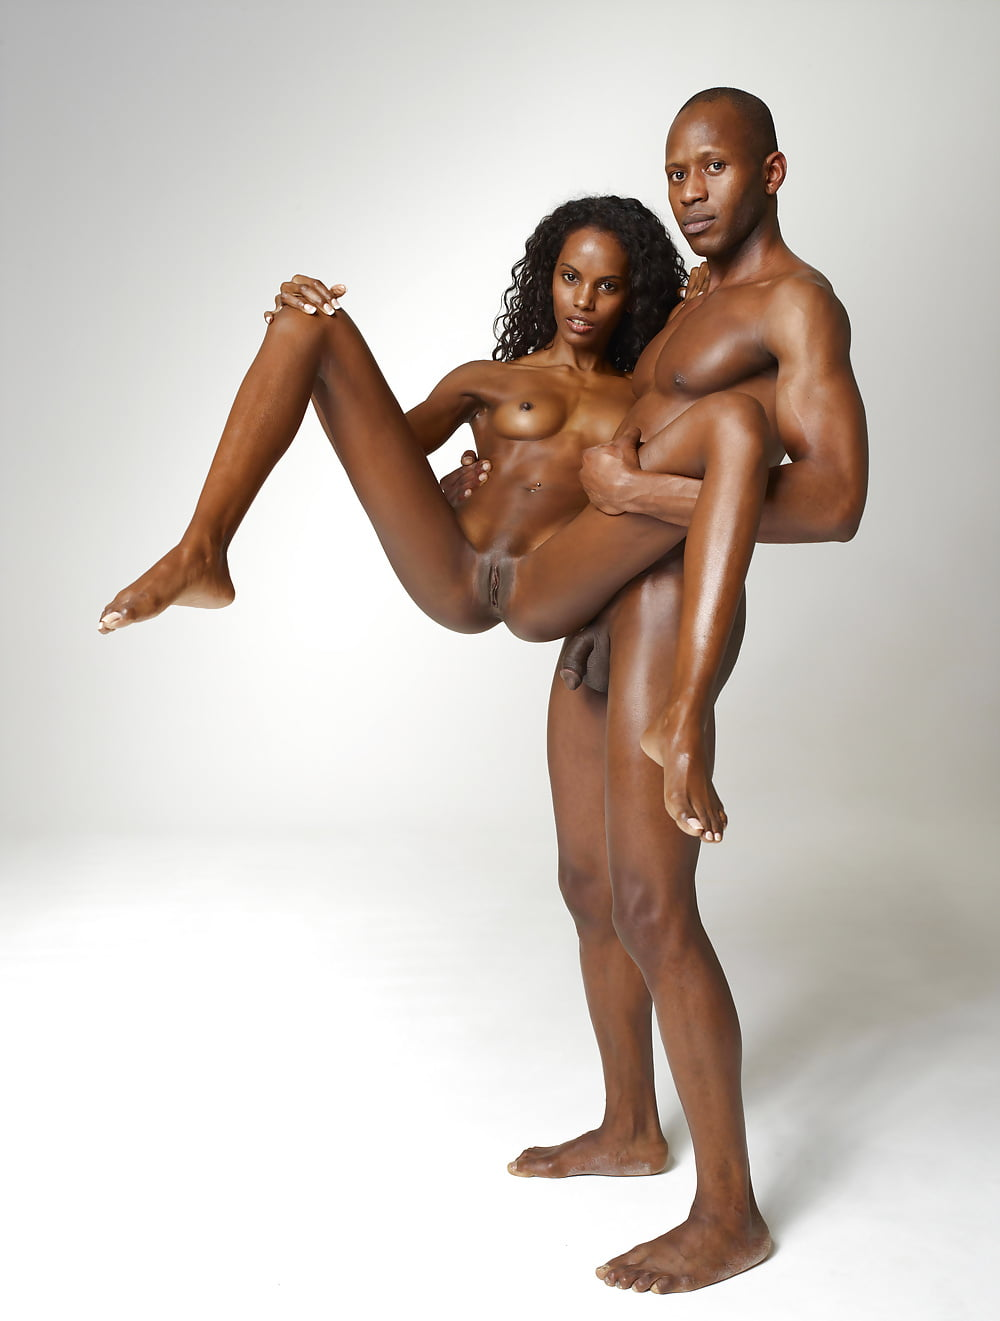 Nakd black people haviing sex